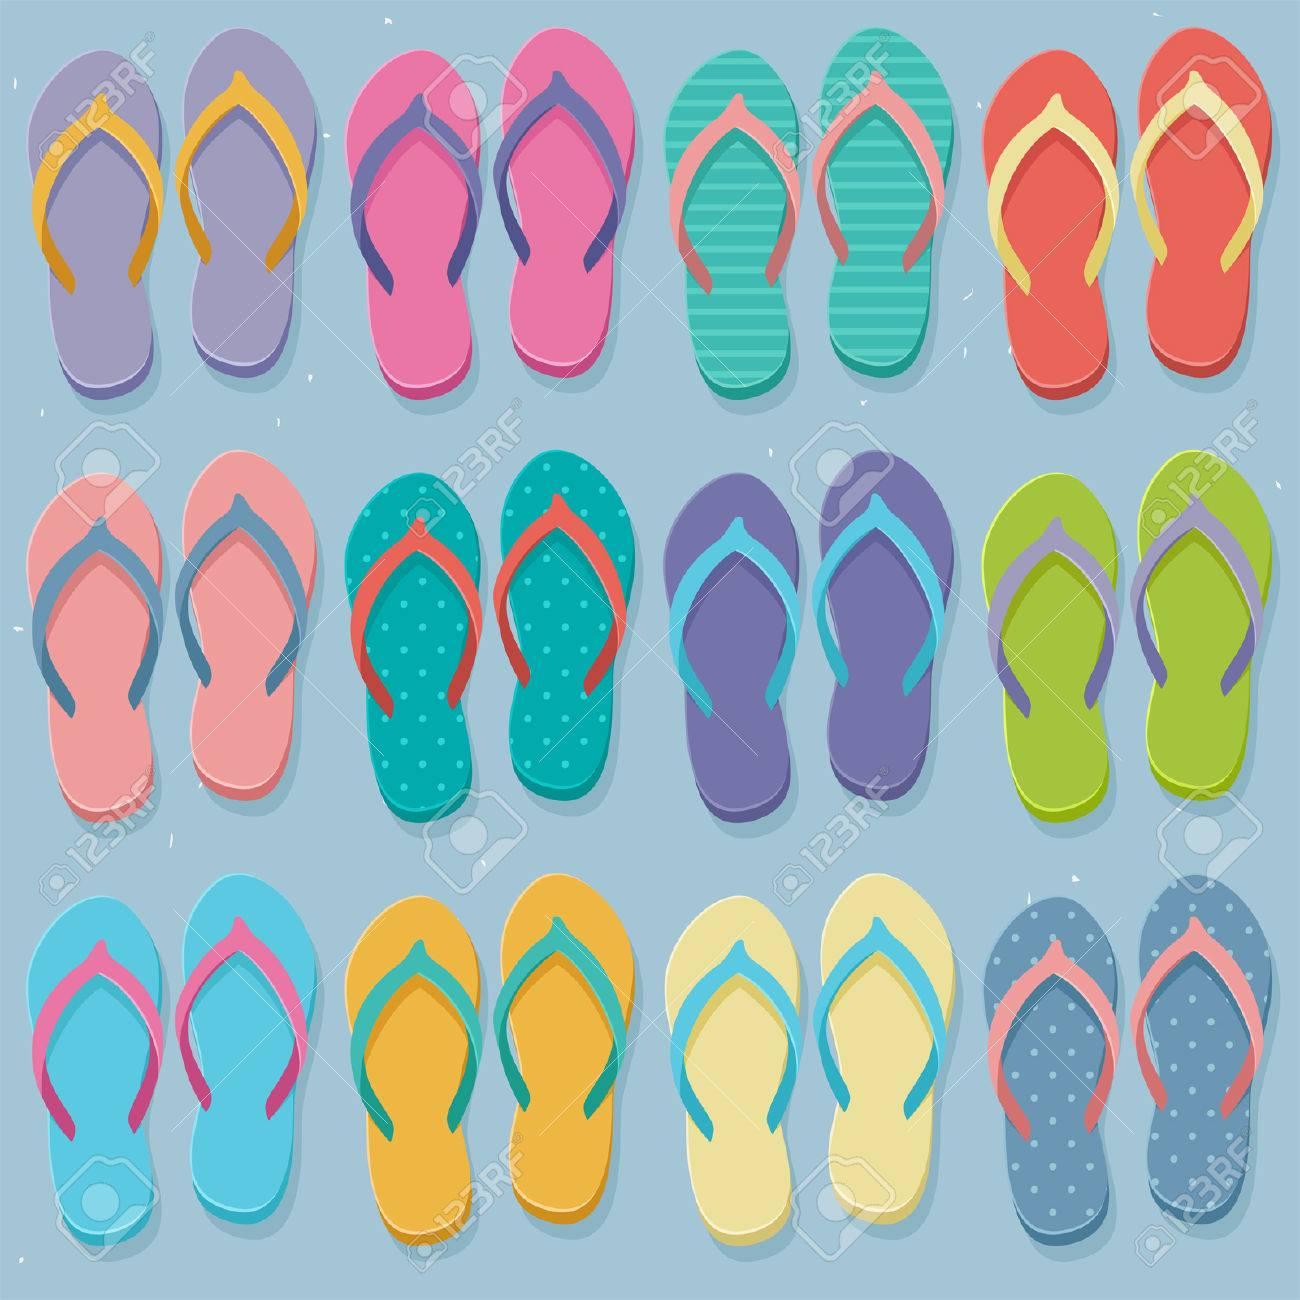 598b81f090cf8 Big Set Of Colorful Pairs Of Flip Flops